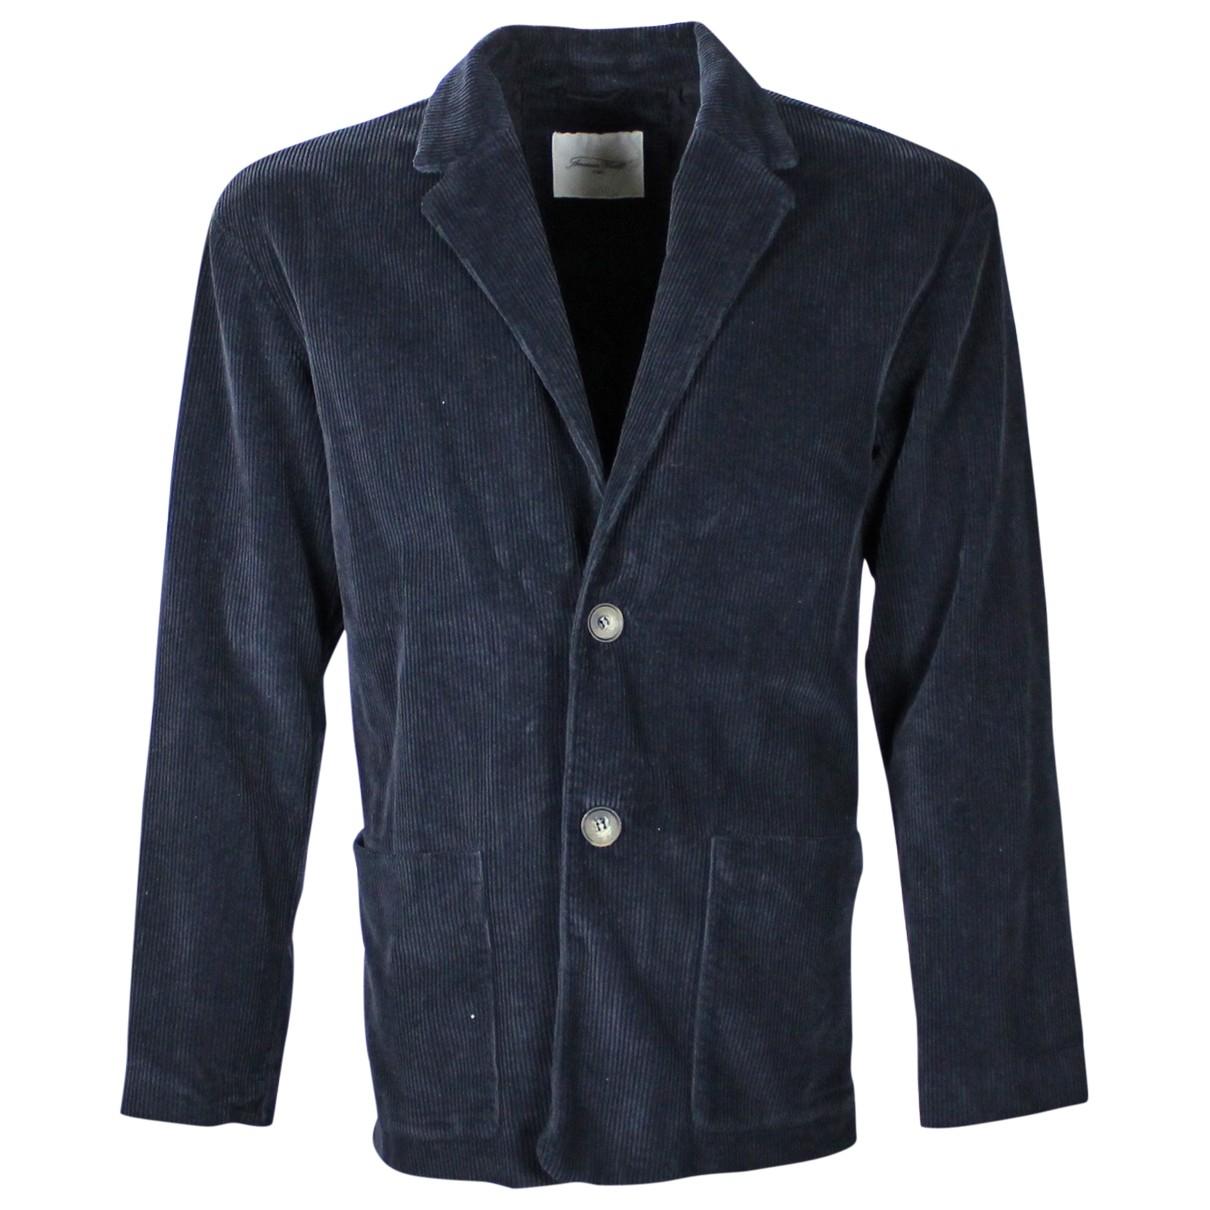 American Vintage \N Navy Cotton jacket  for Men M International